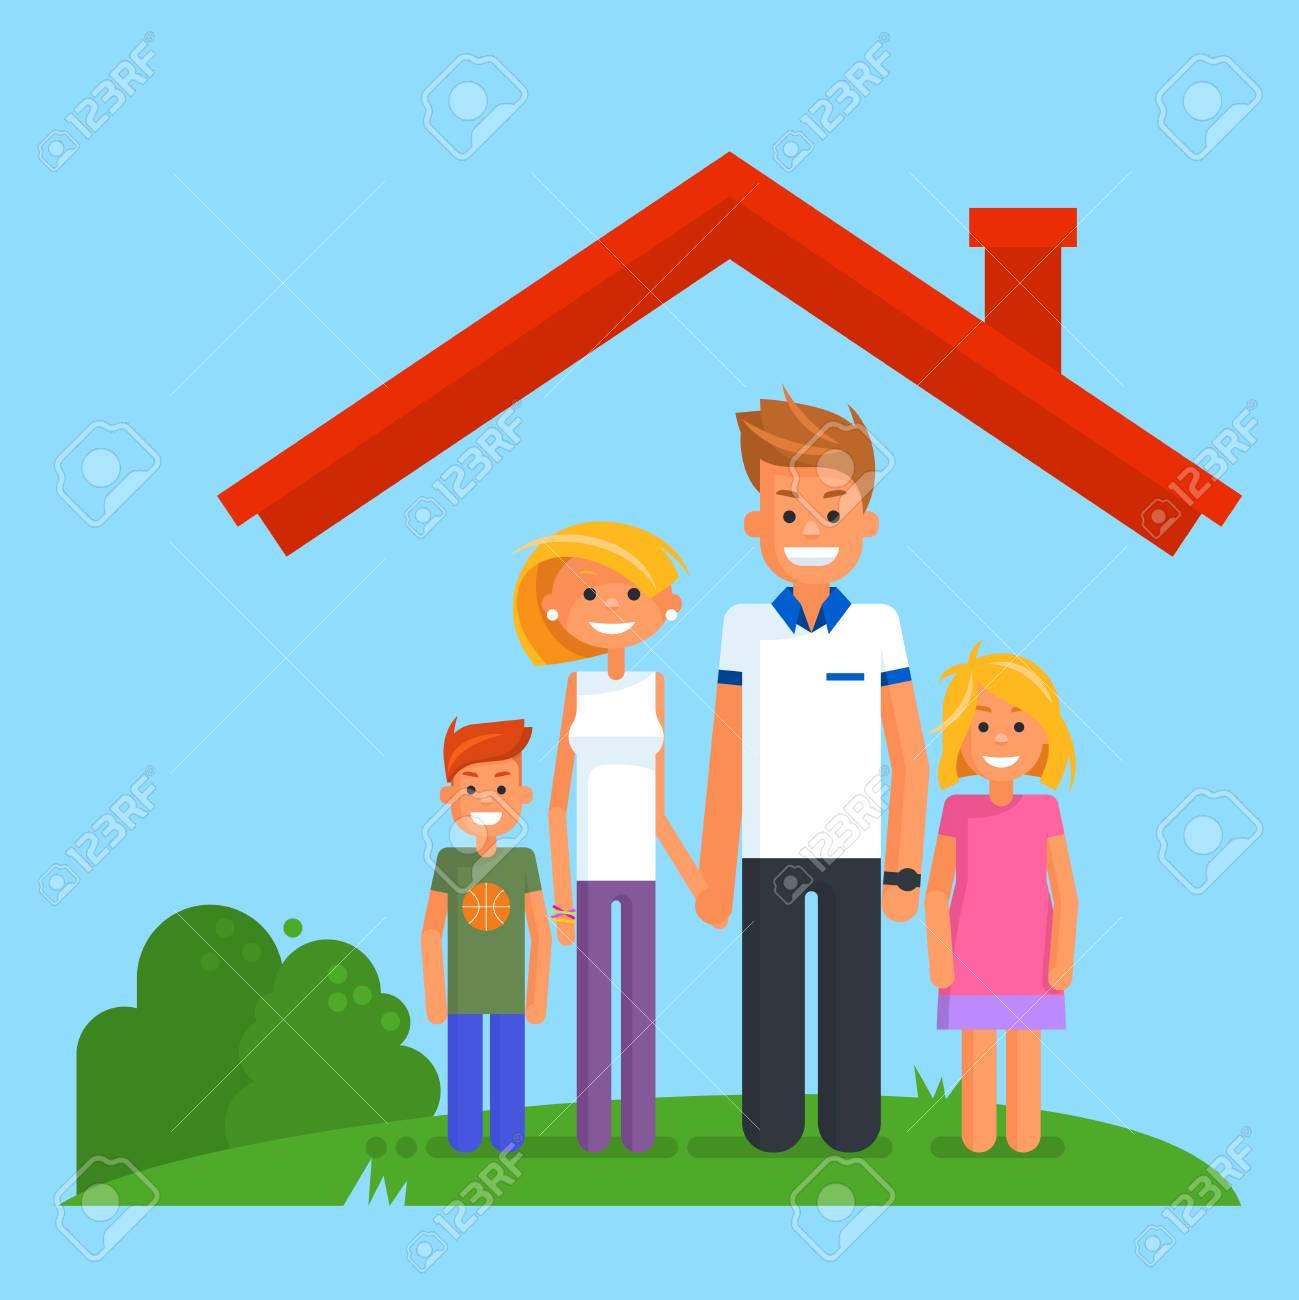 Family Life Insurance Illustration Royalty Free Cliparts Vectors